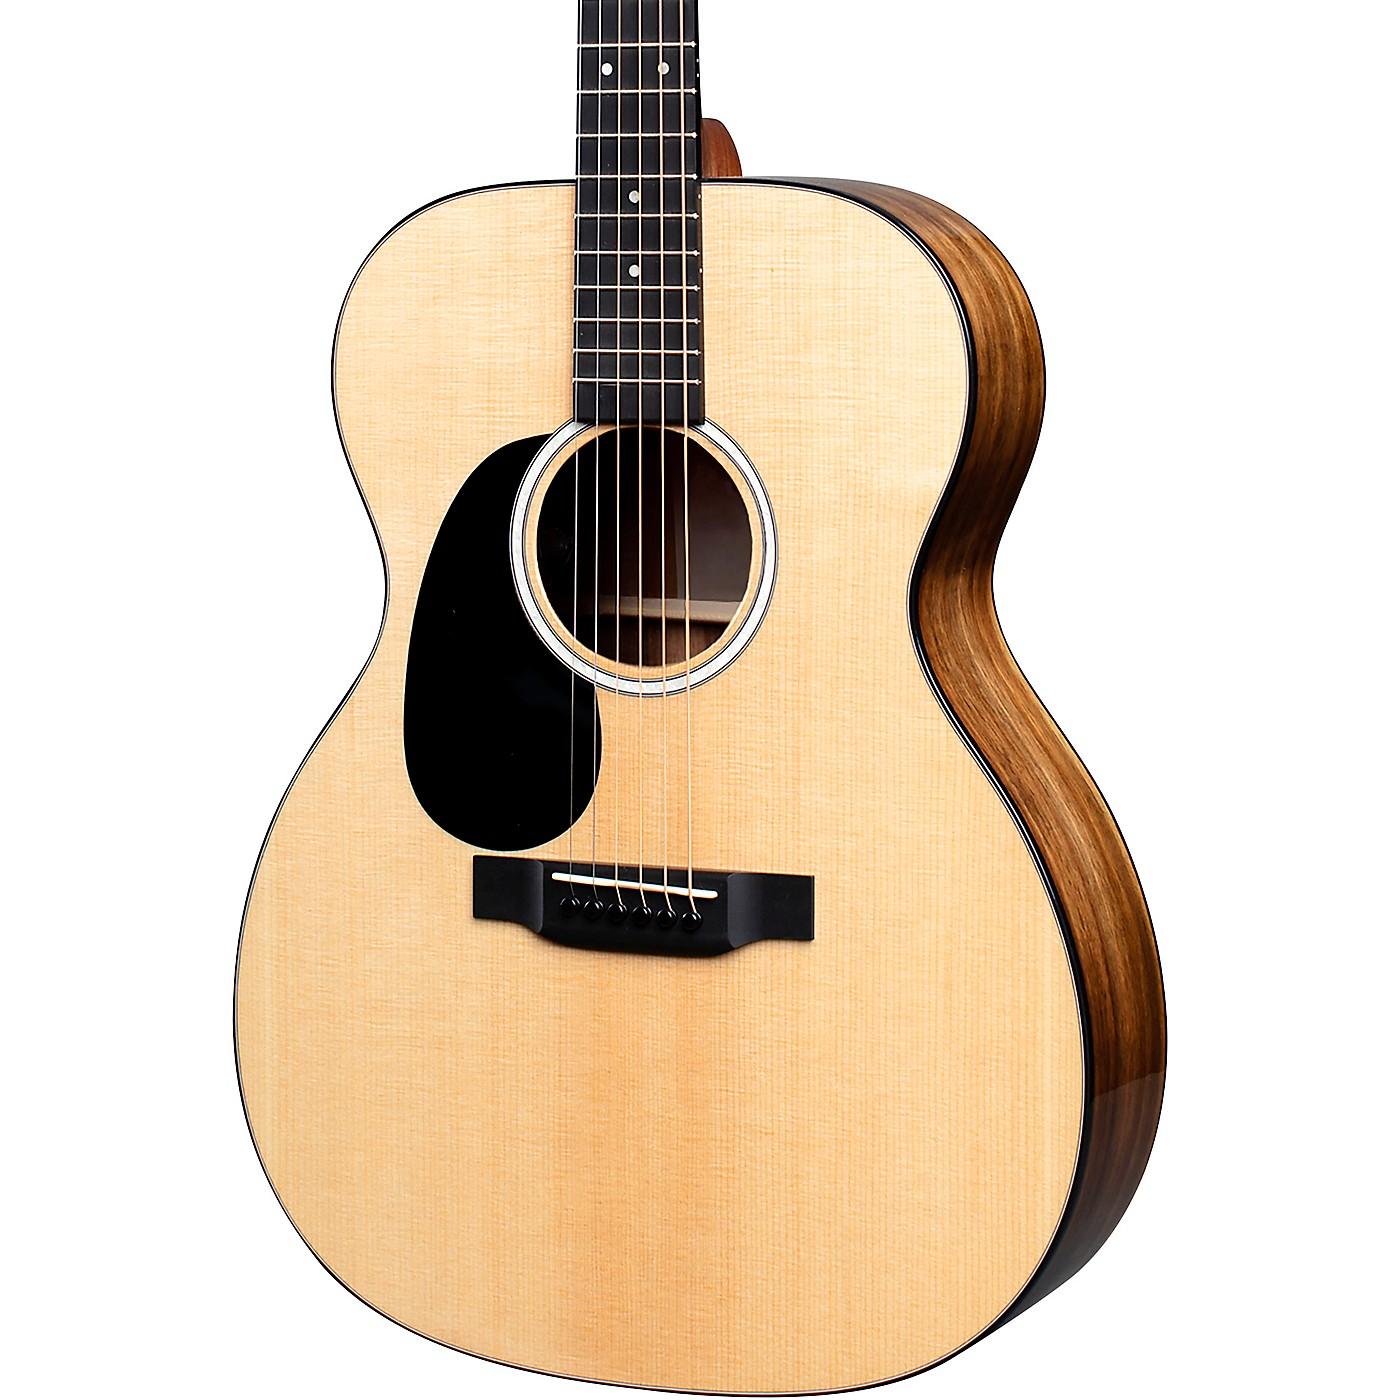 Martin 000-12EL Road Series KOA Fine Veneer Auditorium Left HandedAcoustic-Electric Guitar thumbnail